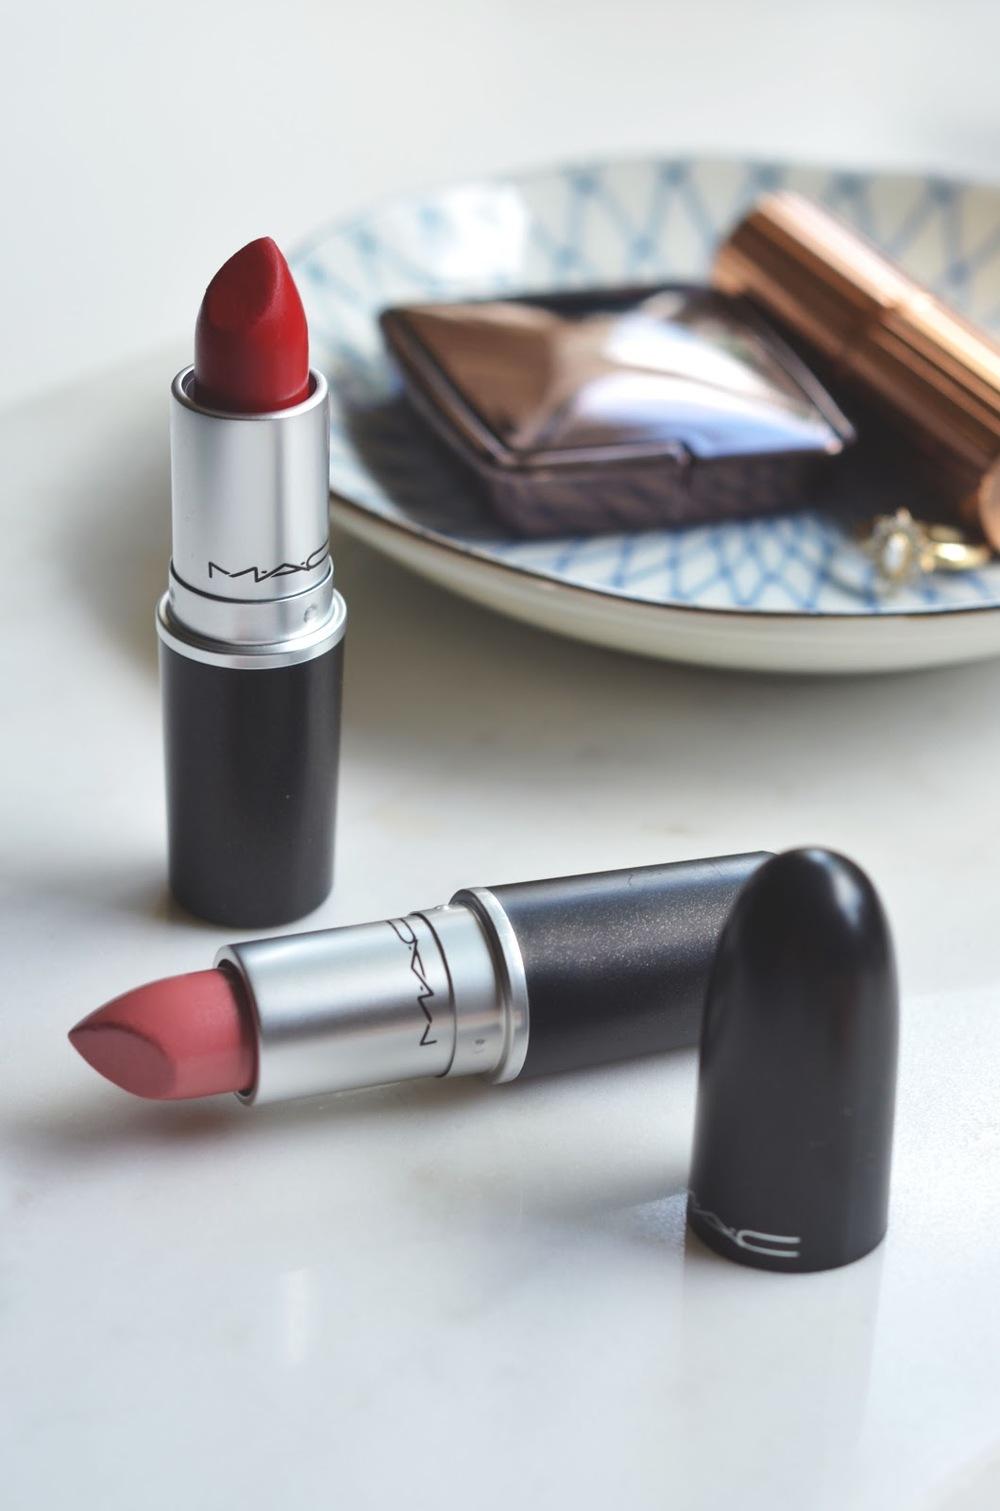 MAC Lipsticks, MAC Ruby Woo, MAC Peach Blossom